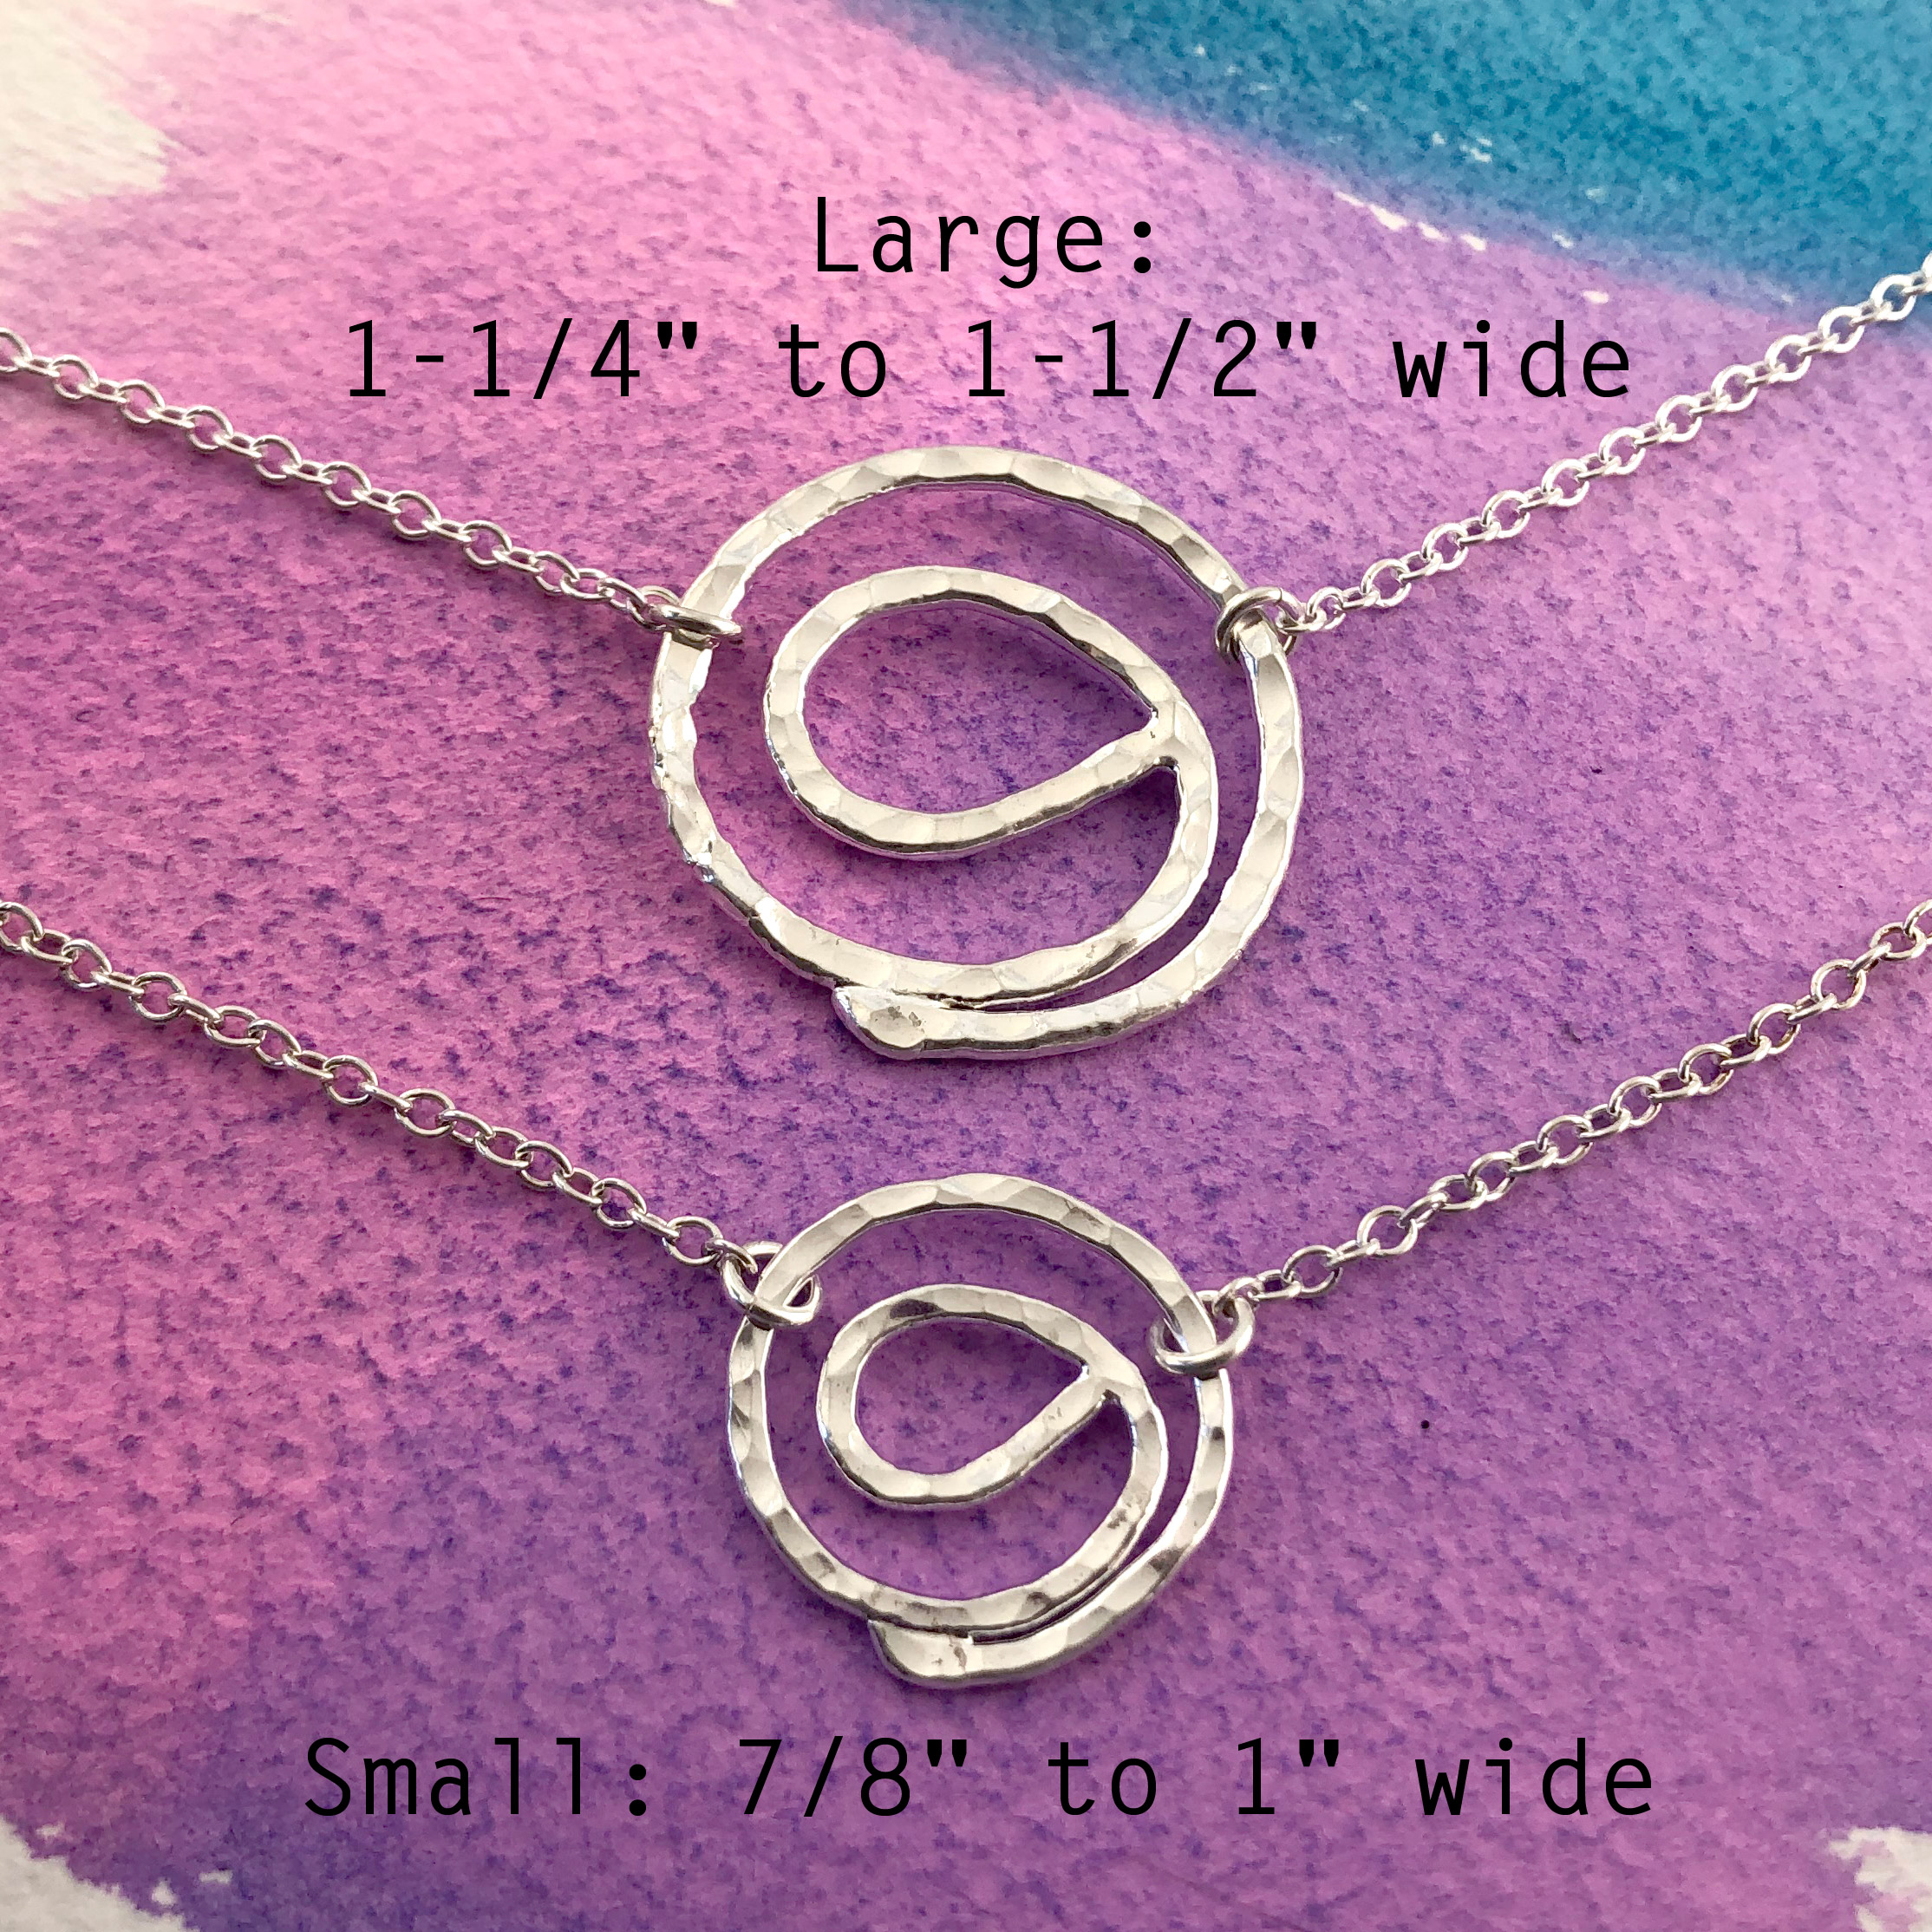 Gratitude Symbol Fine Silver Necklace two sizes shown